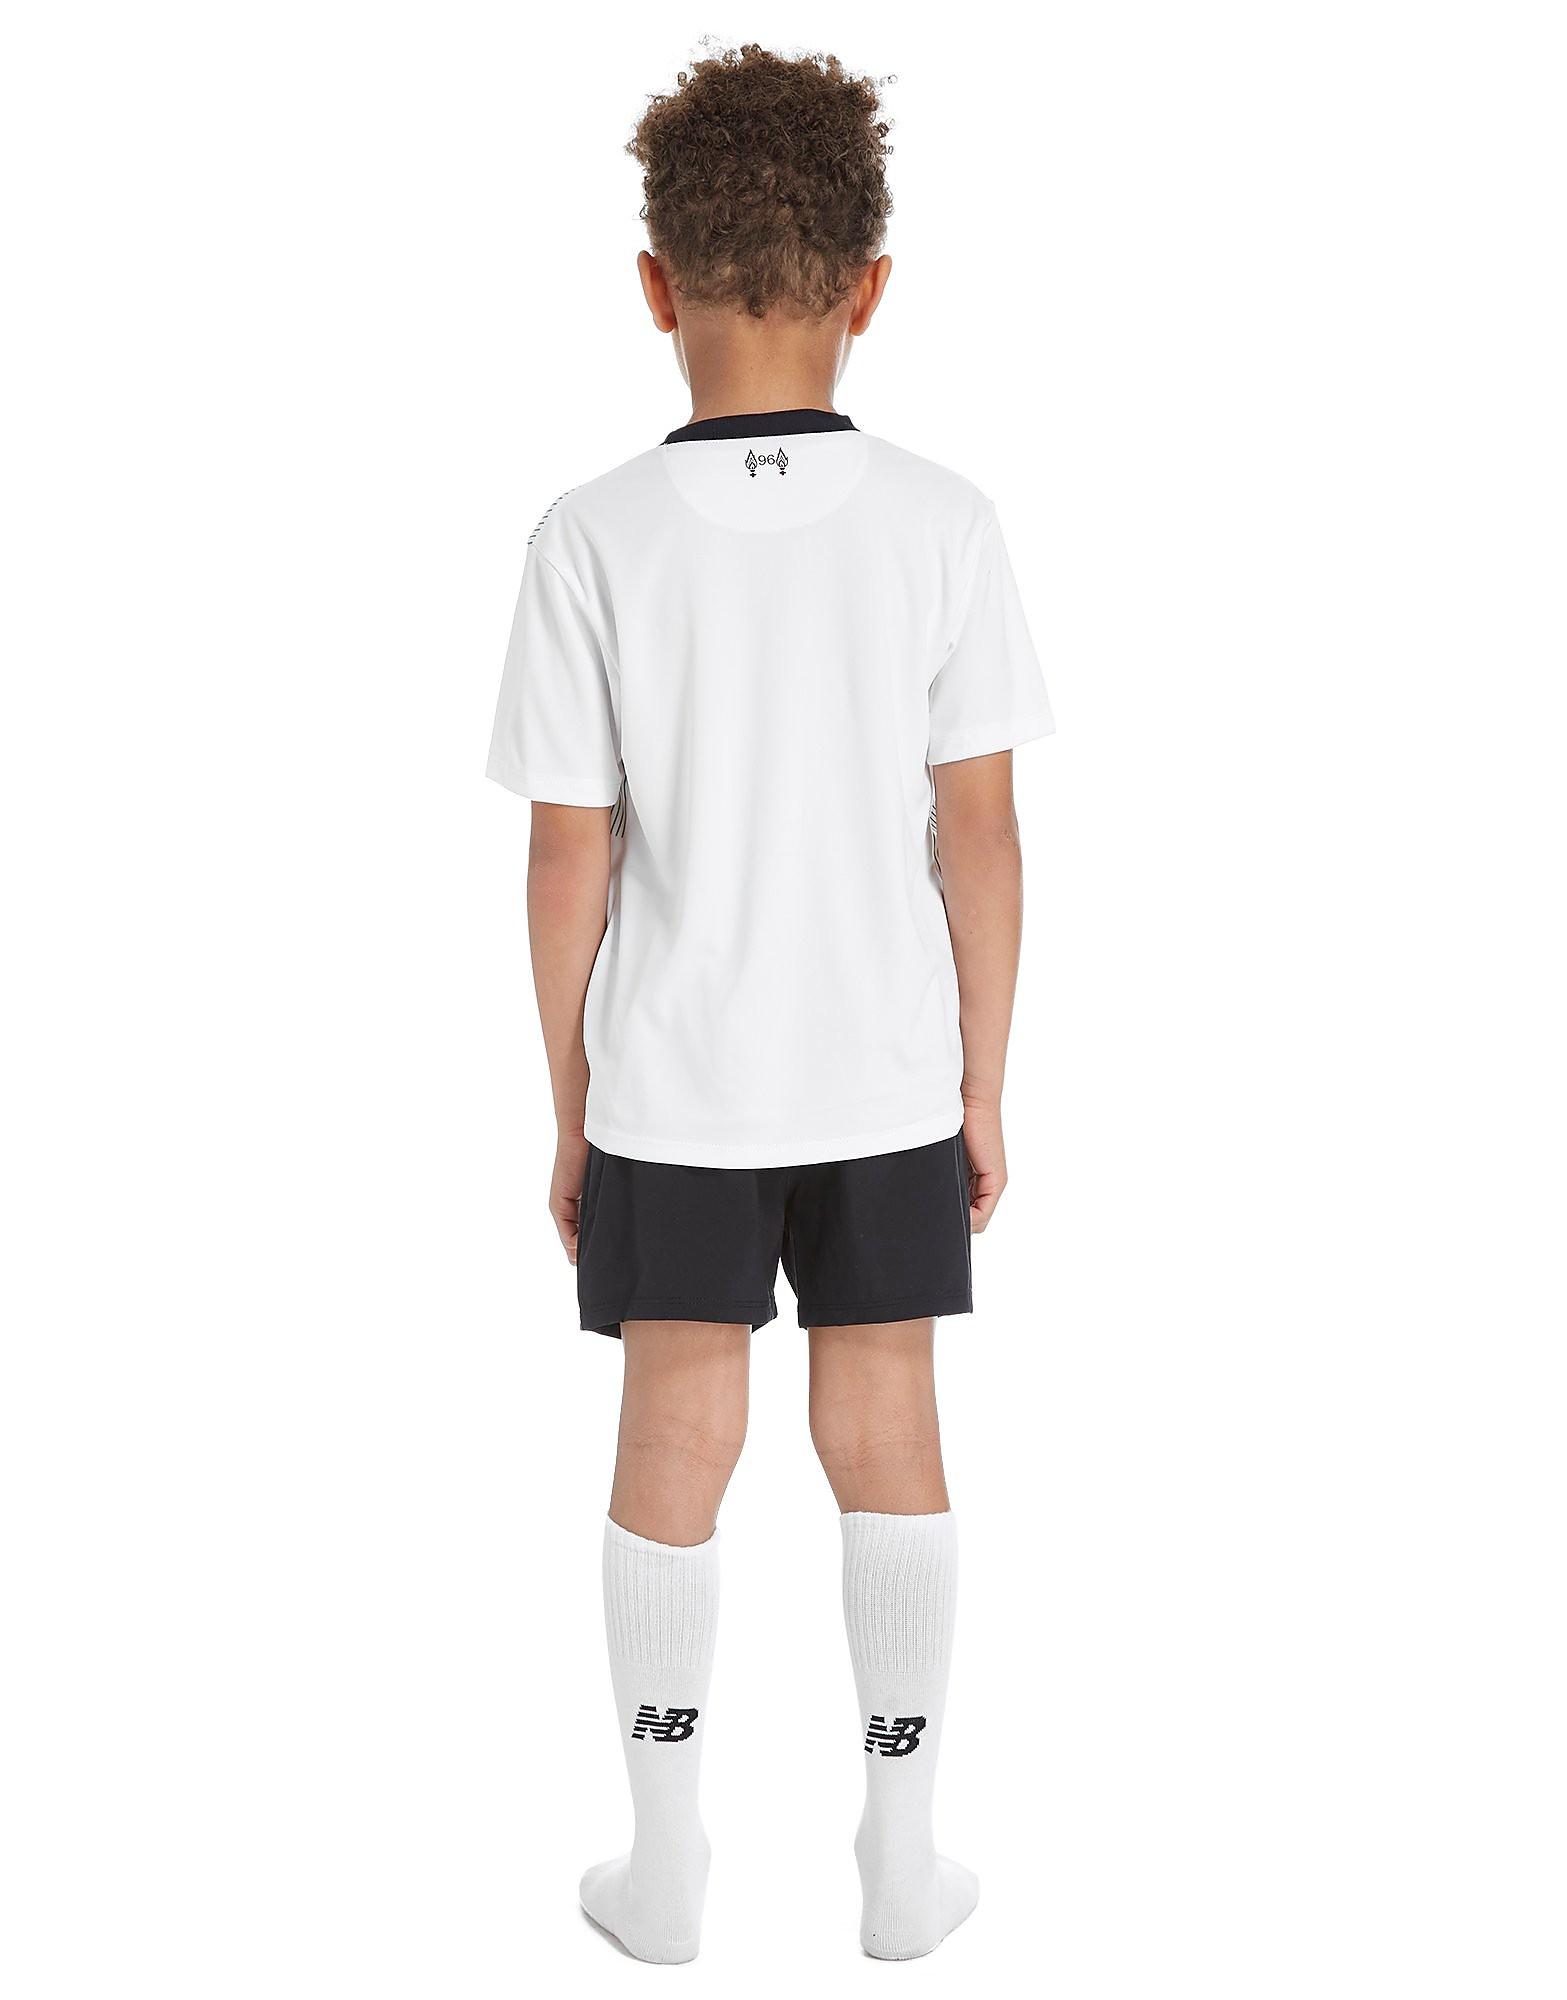 New Balance Liverpool FC 2017/18 Away Kit Children